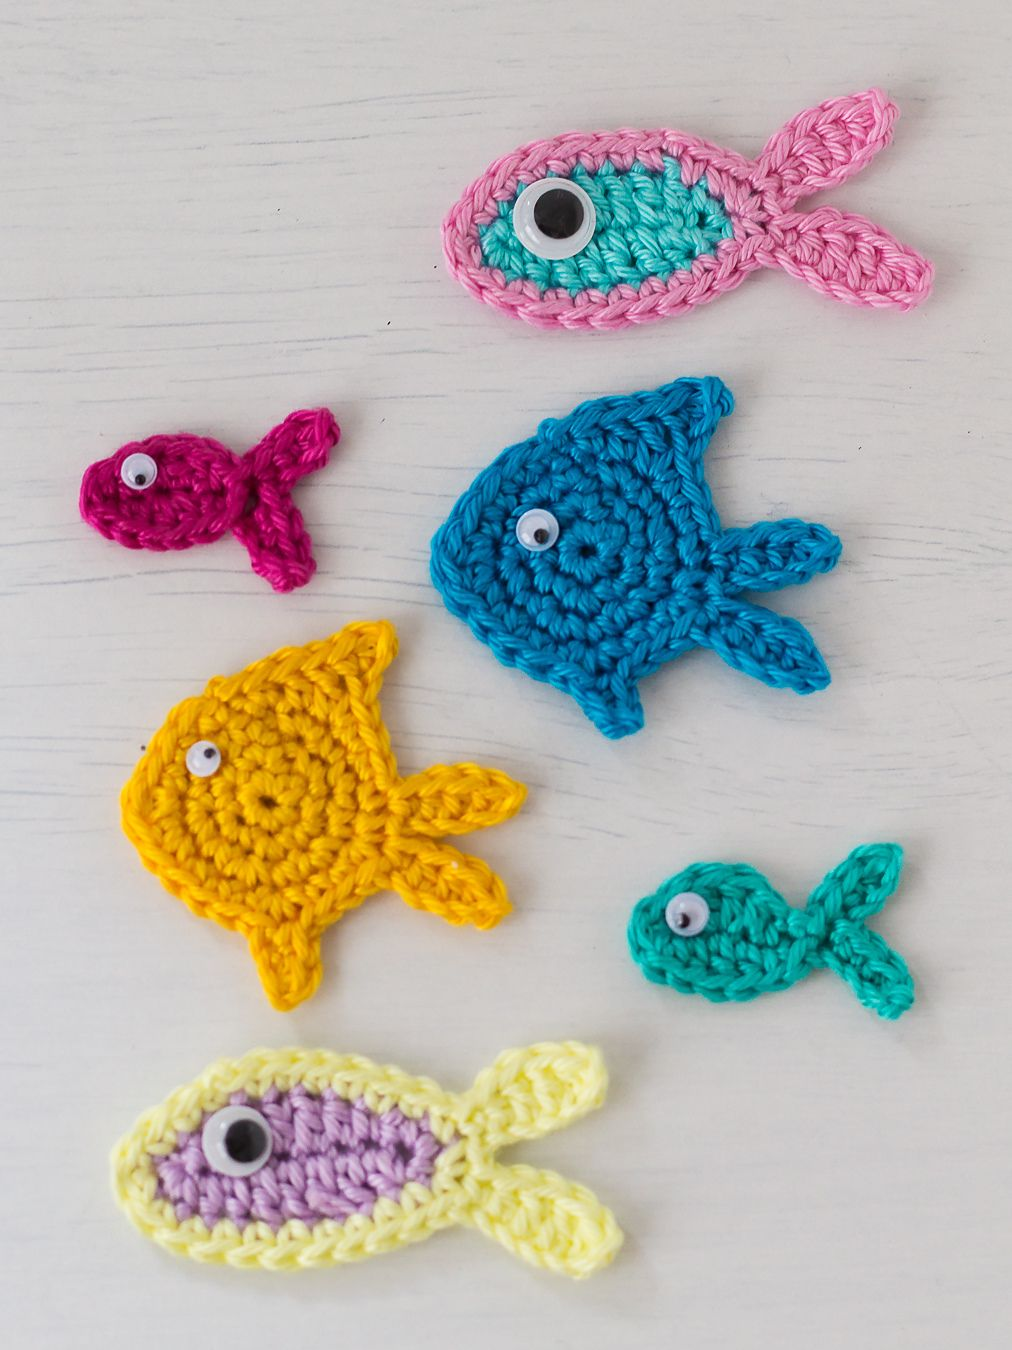 Three Little Fish Crochet Appliques By Carmen Rosemann - Free ...